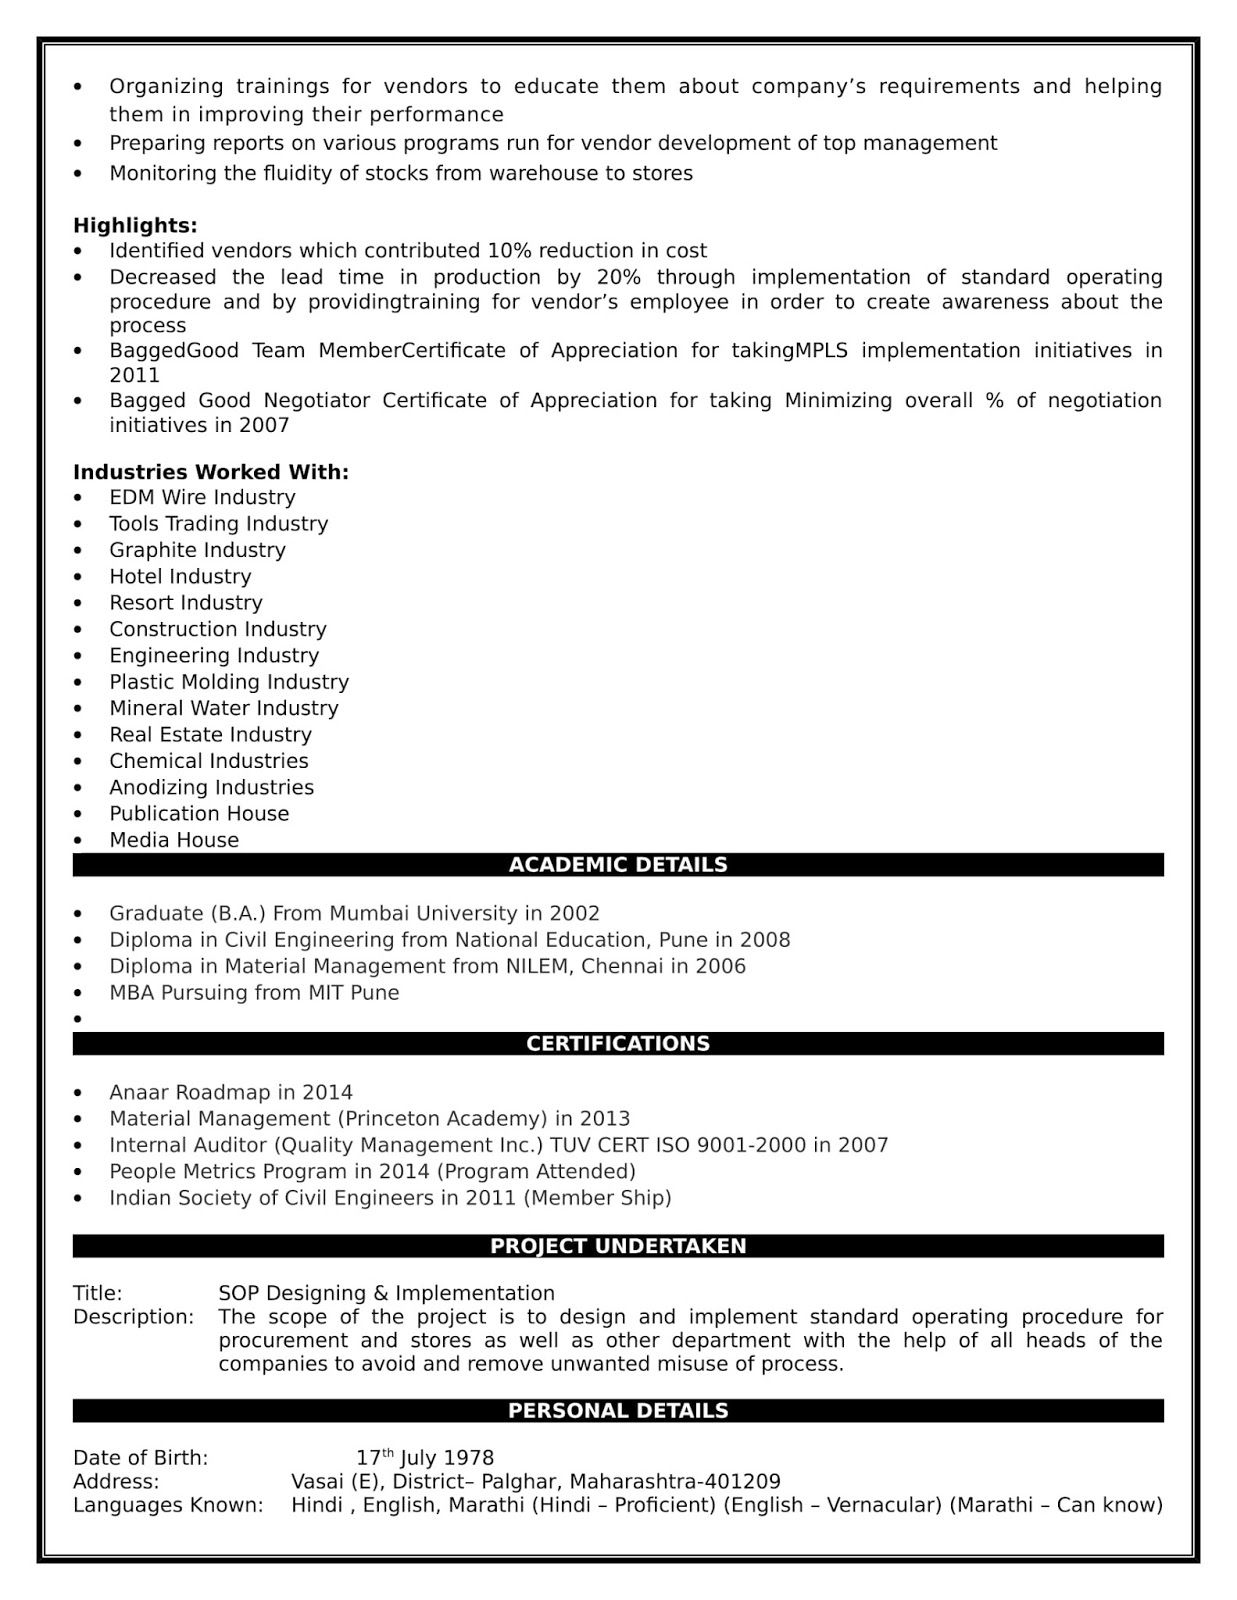 Bimlendra Jha Resume For Purchase Management Management Operations Management Purchase Manager